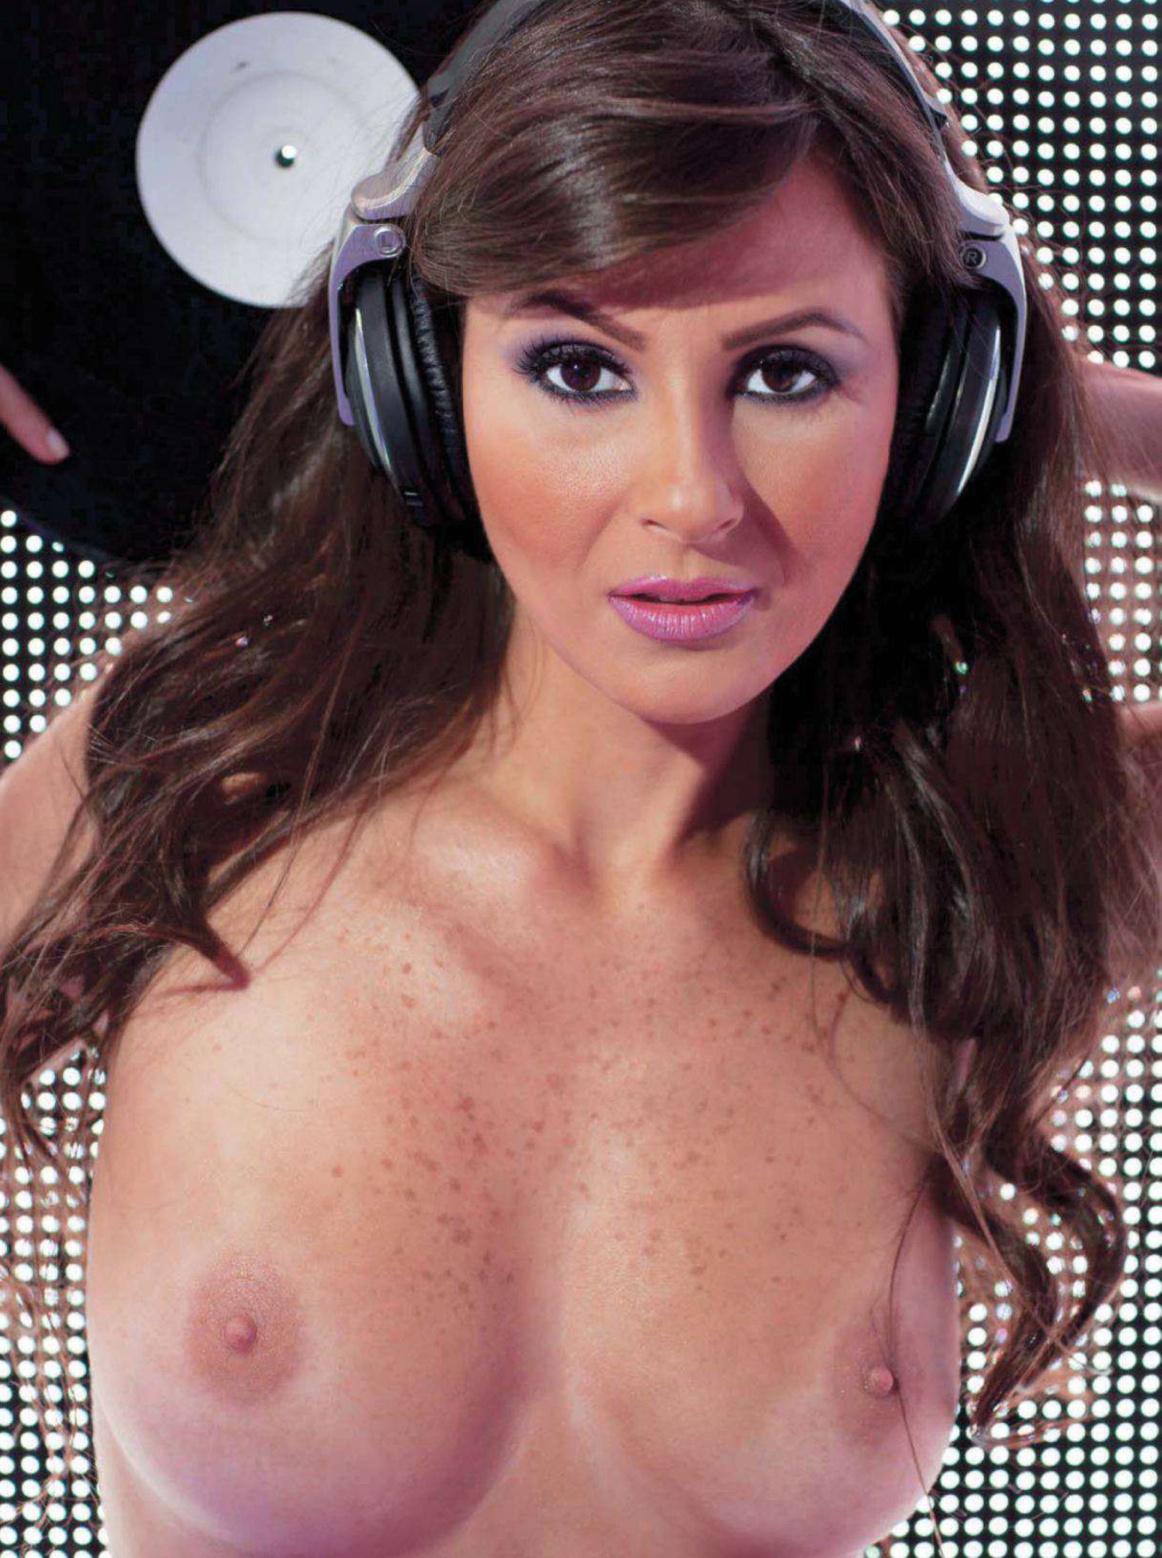 36684_septimiu29_DJAgniezka_PlayboyVenezuela_Sept20127_123_520lo.jpg